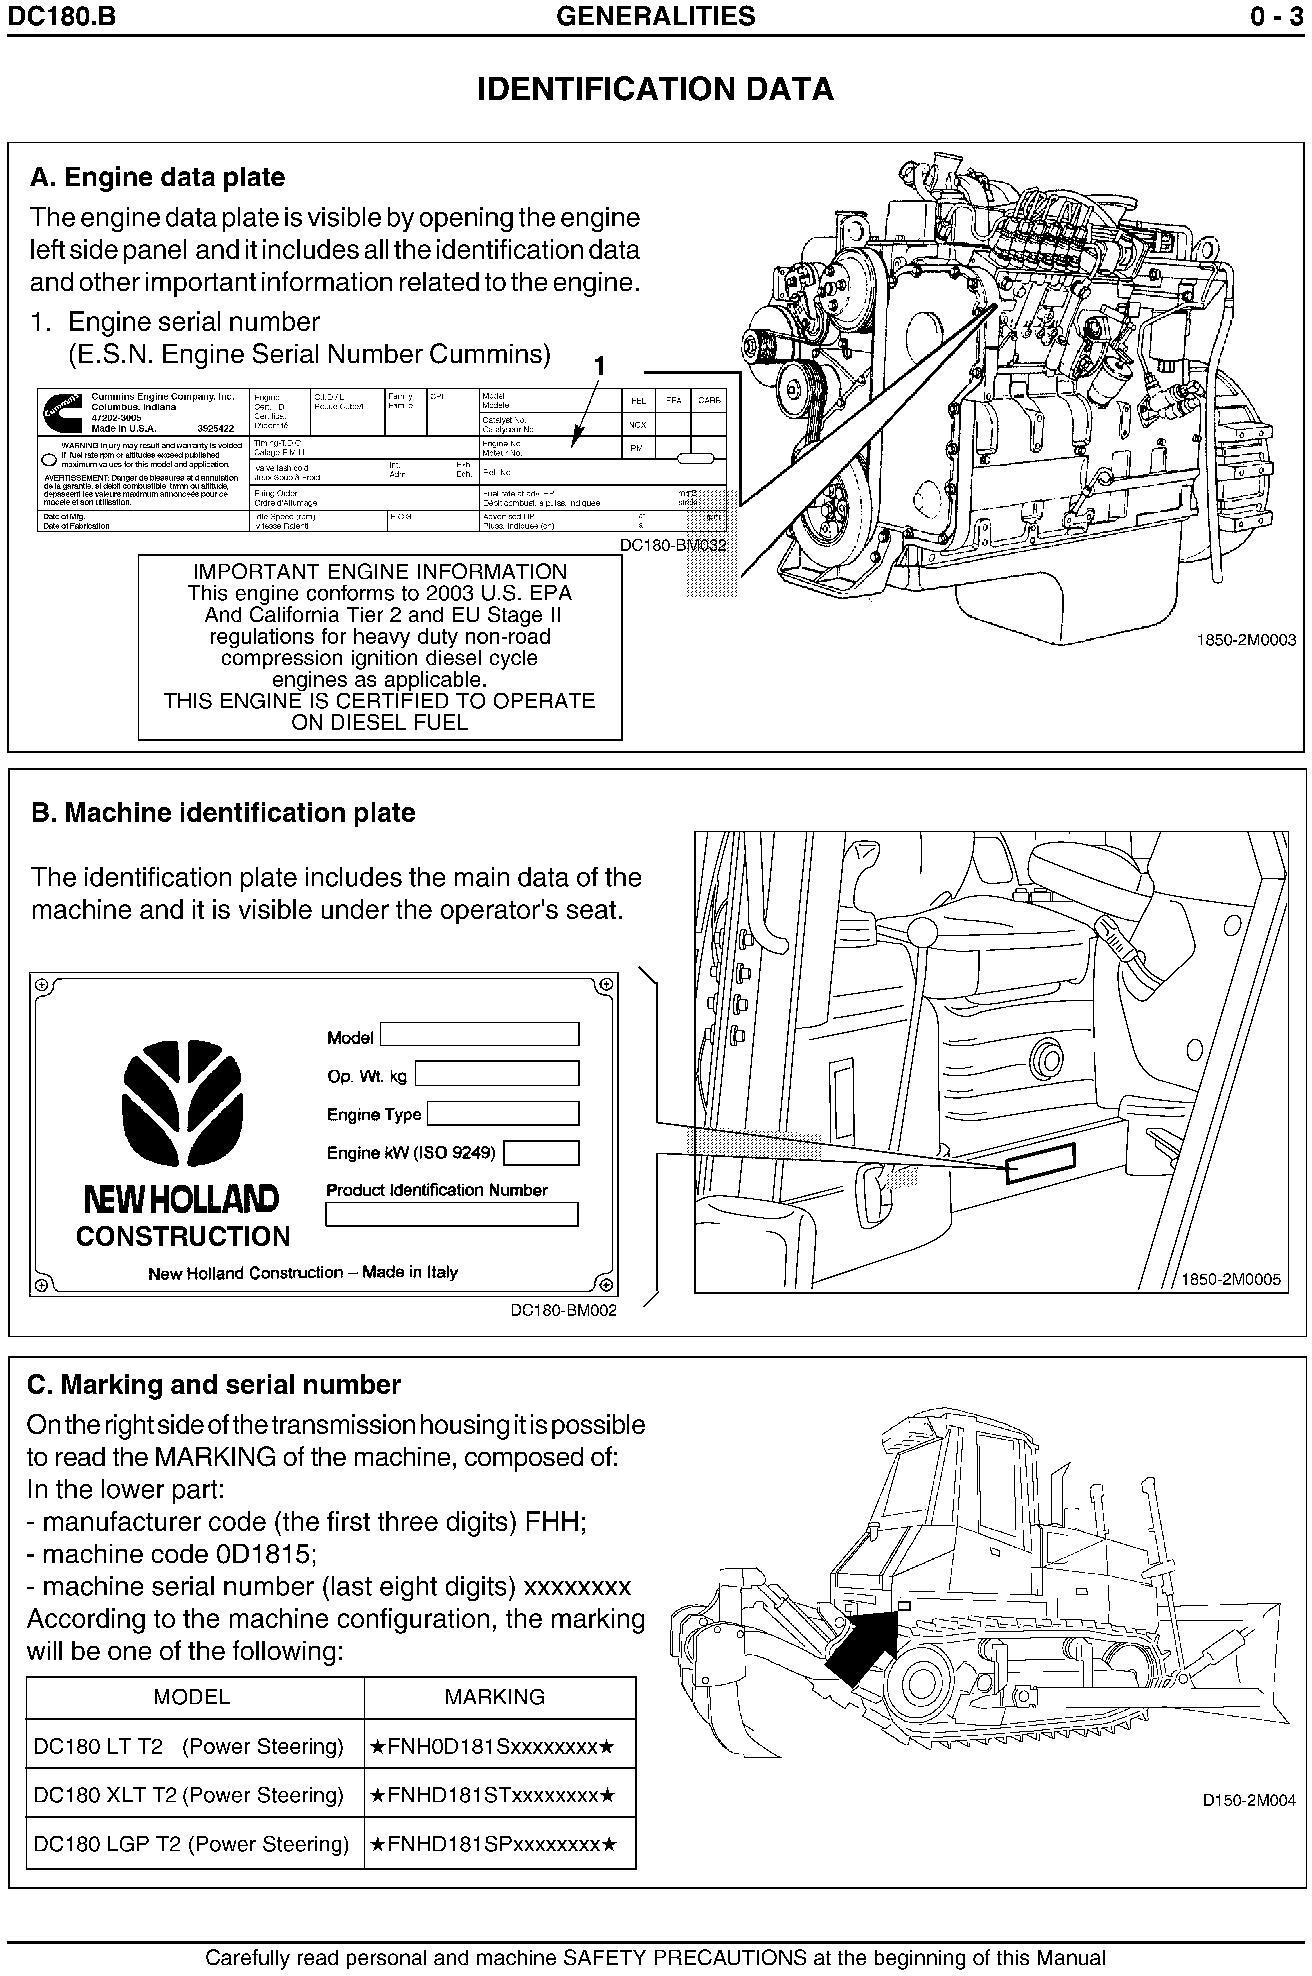 New Holland DC180.B Crawler Dozer Complete Service Manual - 2